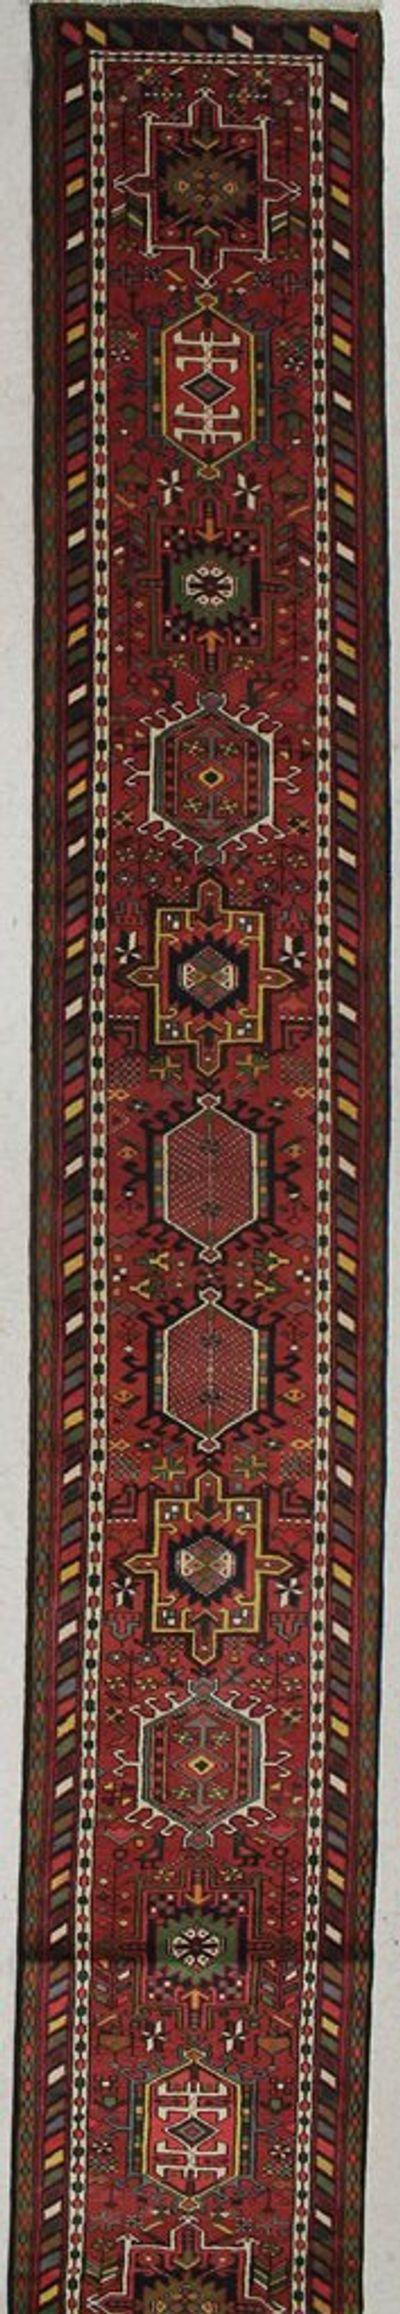 Rust Karacah Rug #7524 • 2′4″ x 16′6″ • Wool on Cotton